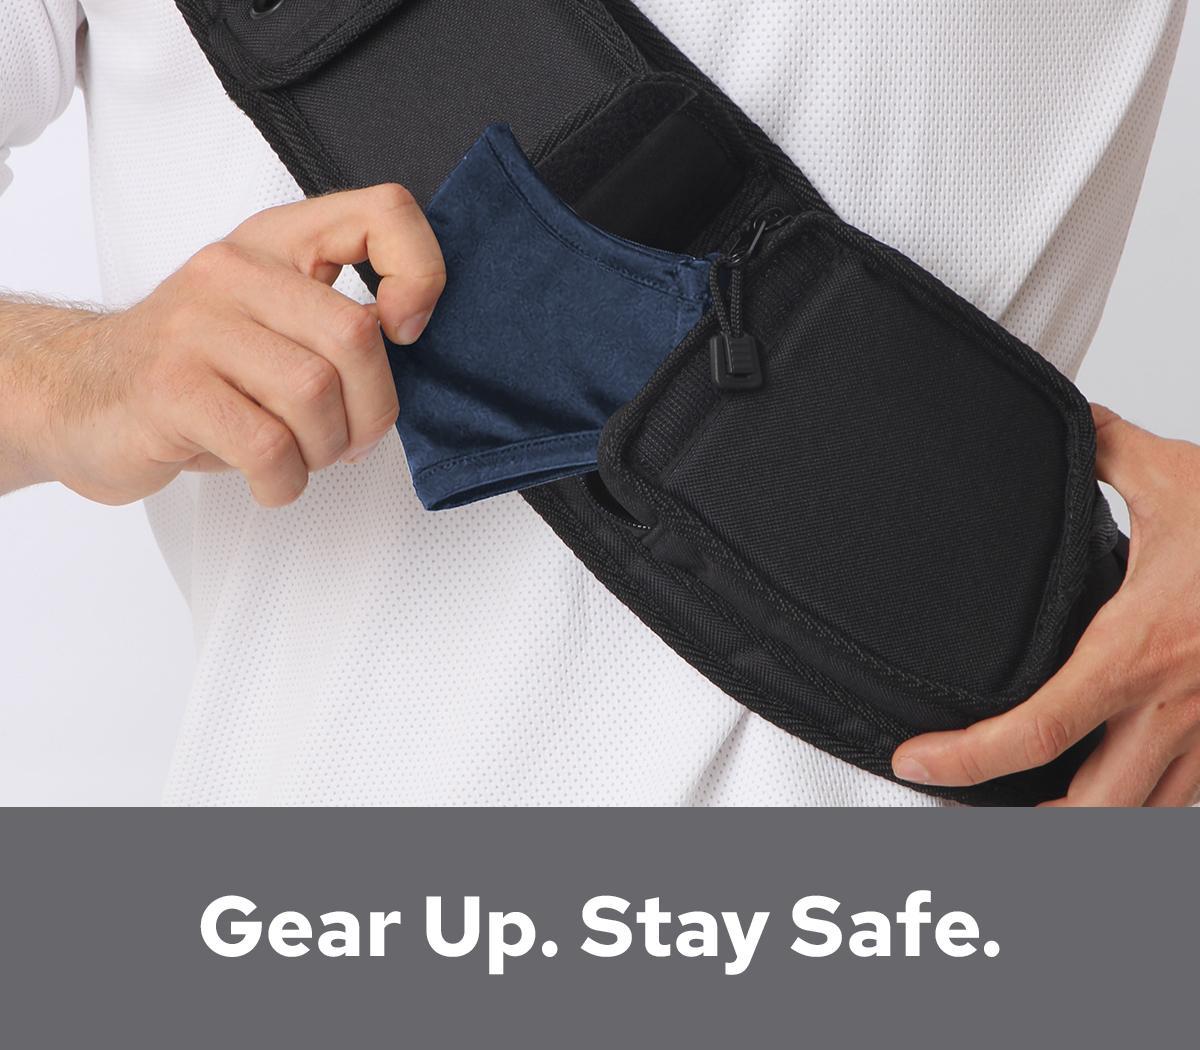 gear-up.-stay-safe..jpg